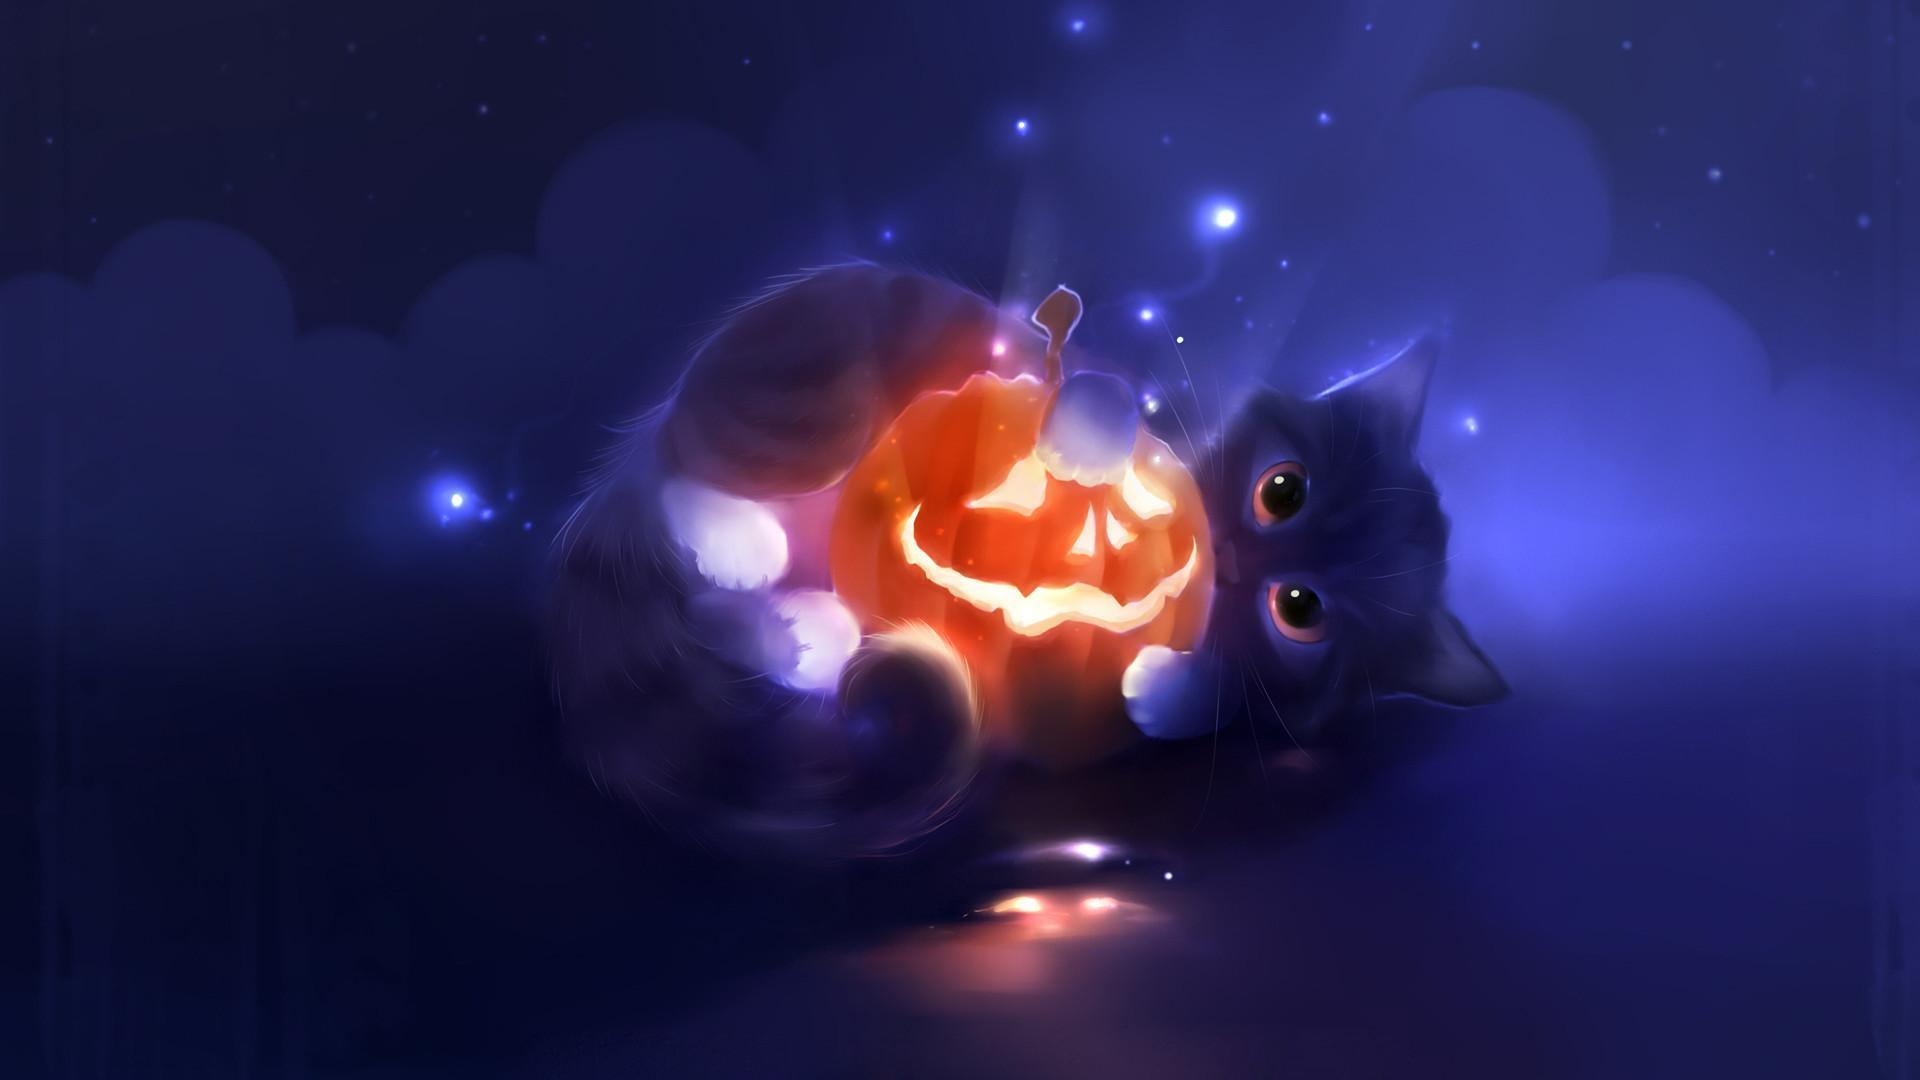 Cute Cat Halloween Wallpapers